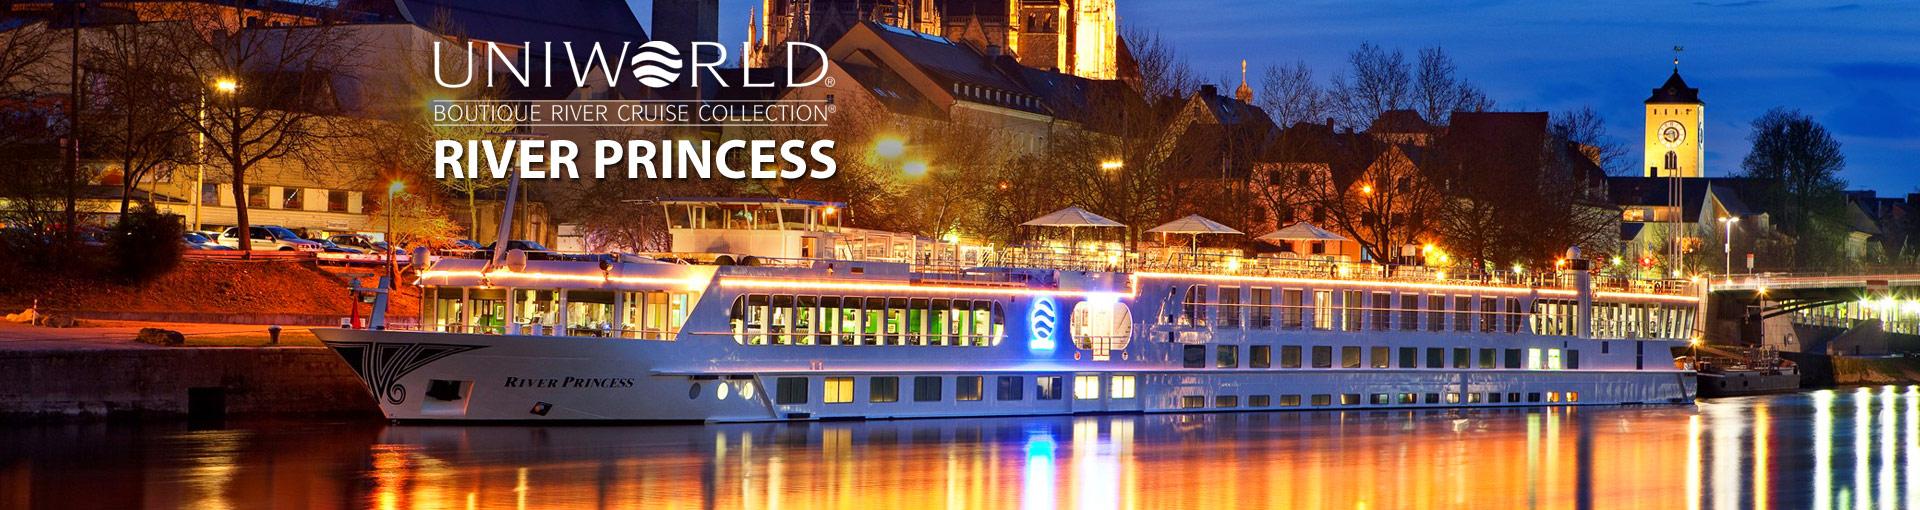 Uniworld River Cruises River Princess river ship